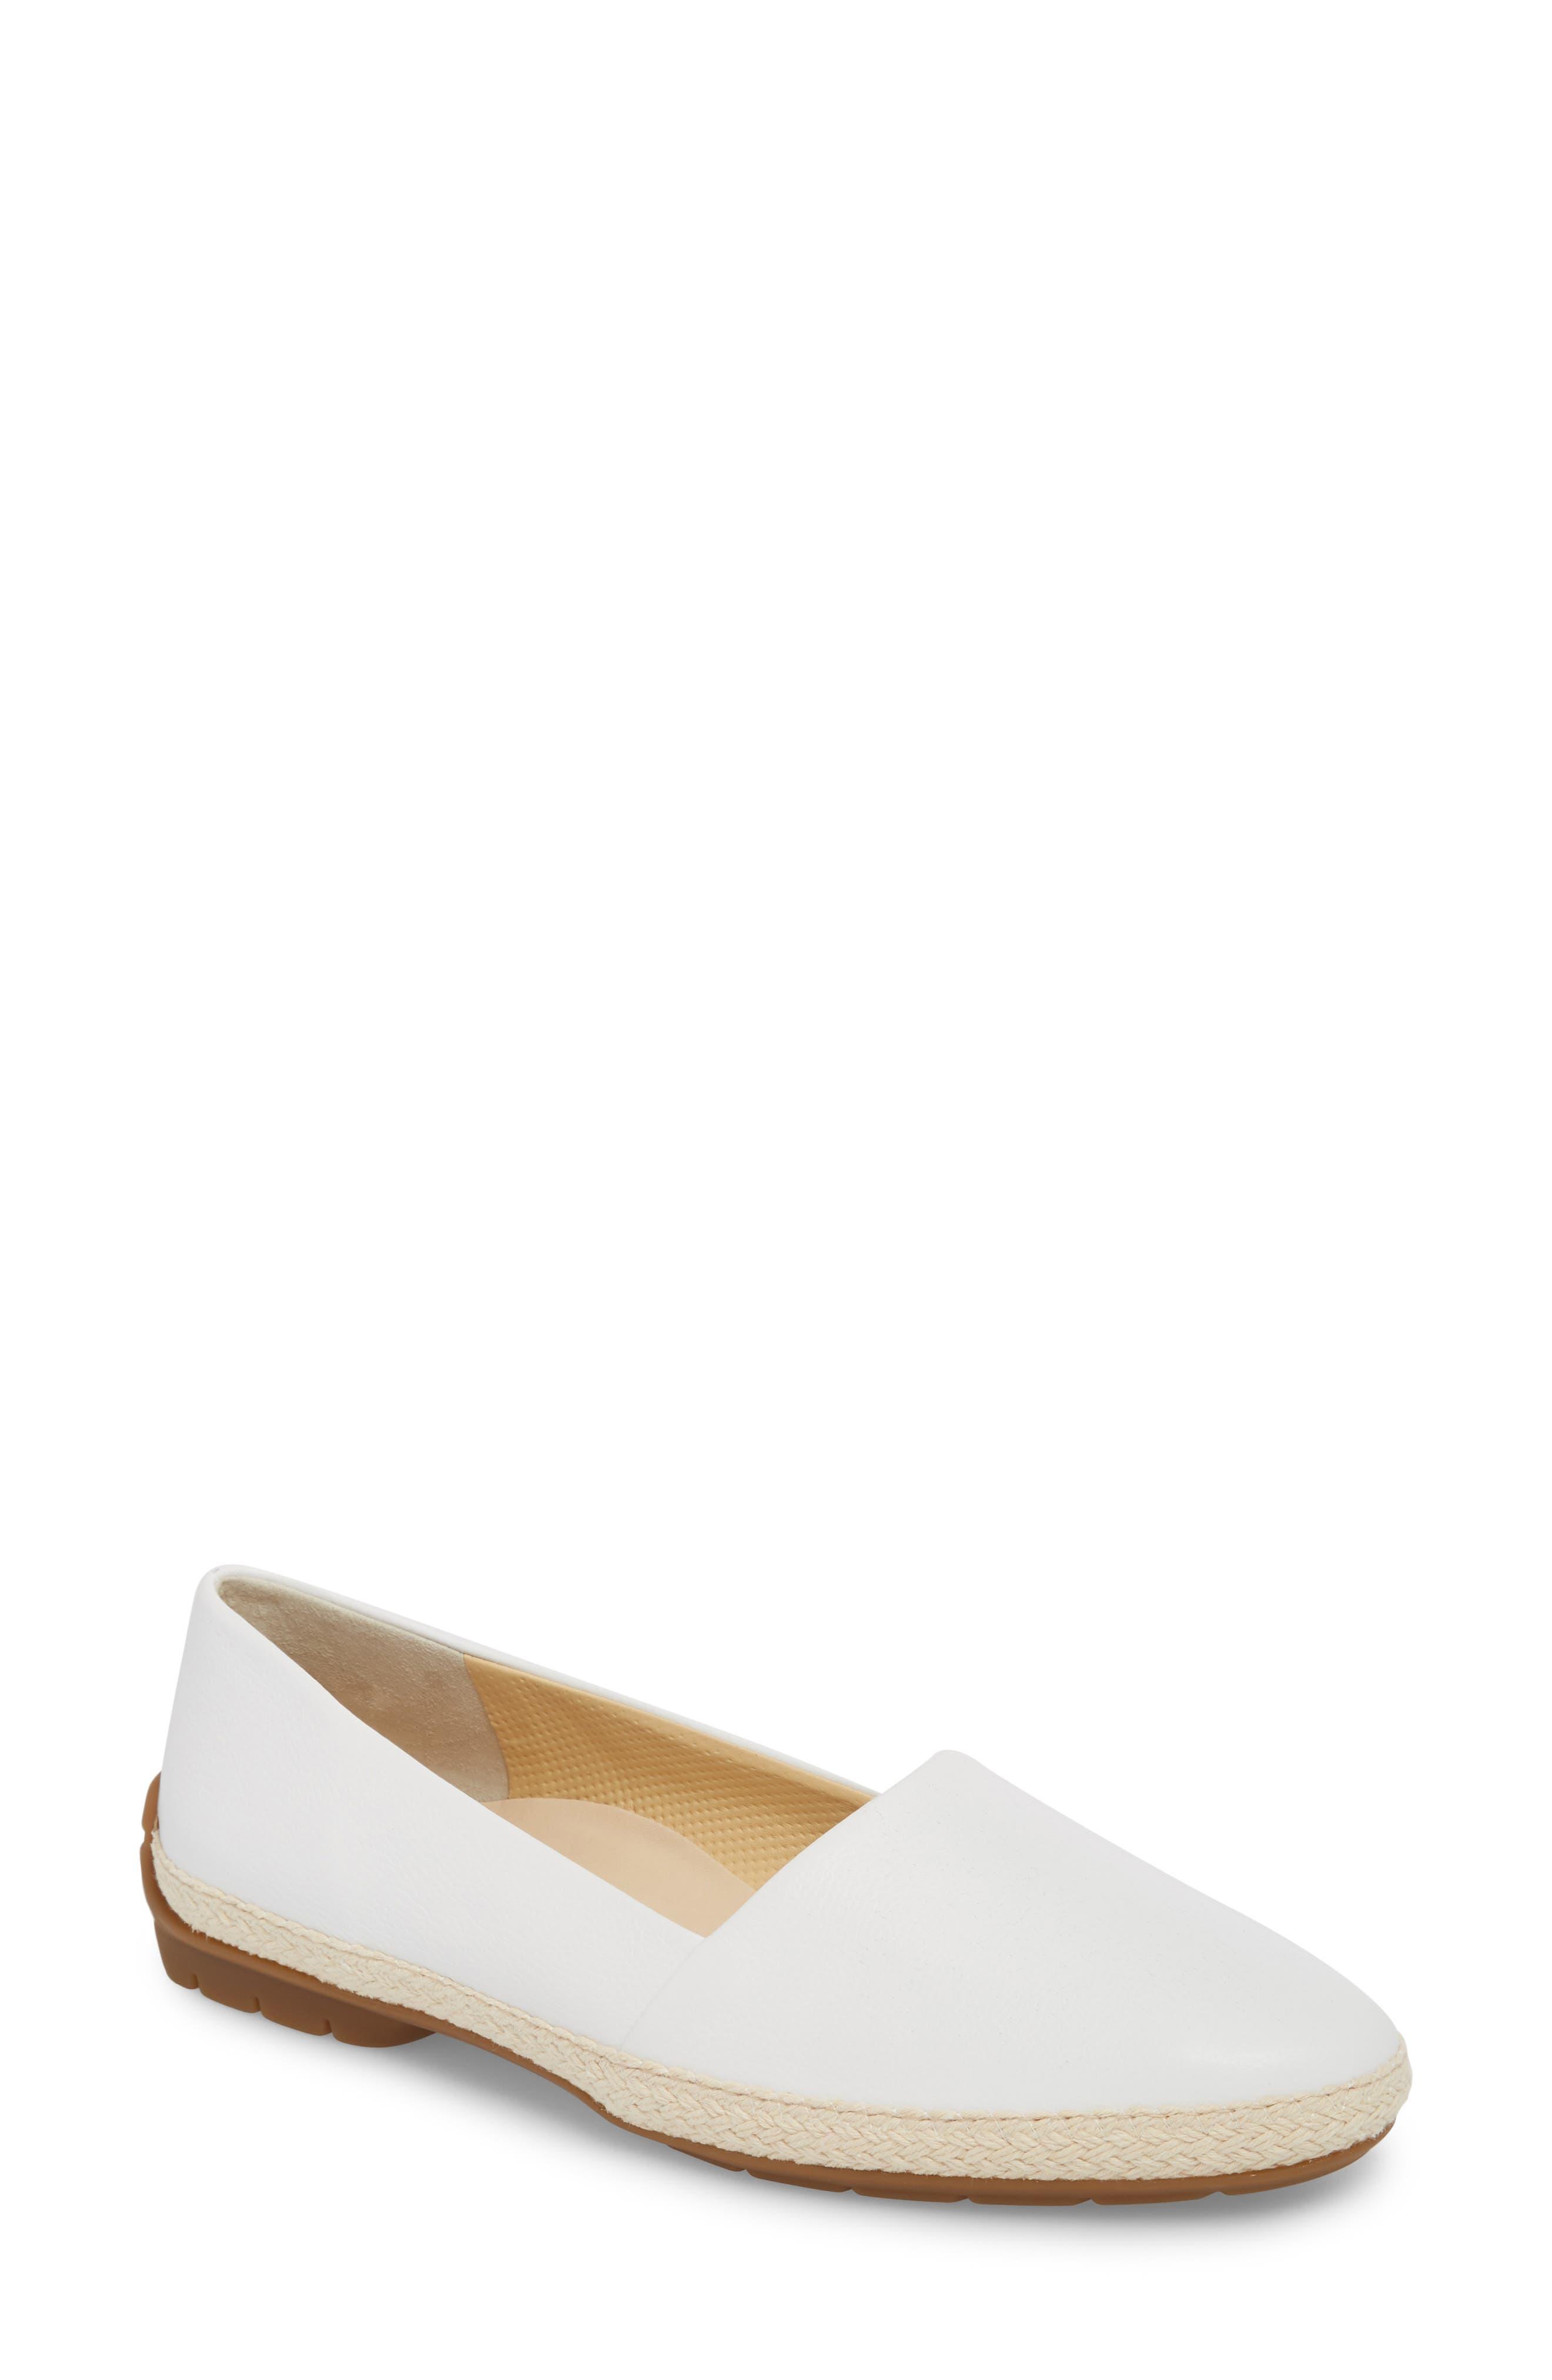 Roxy Espadrille,                             Main thumbnail 1, color,                             White Leather